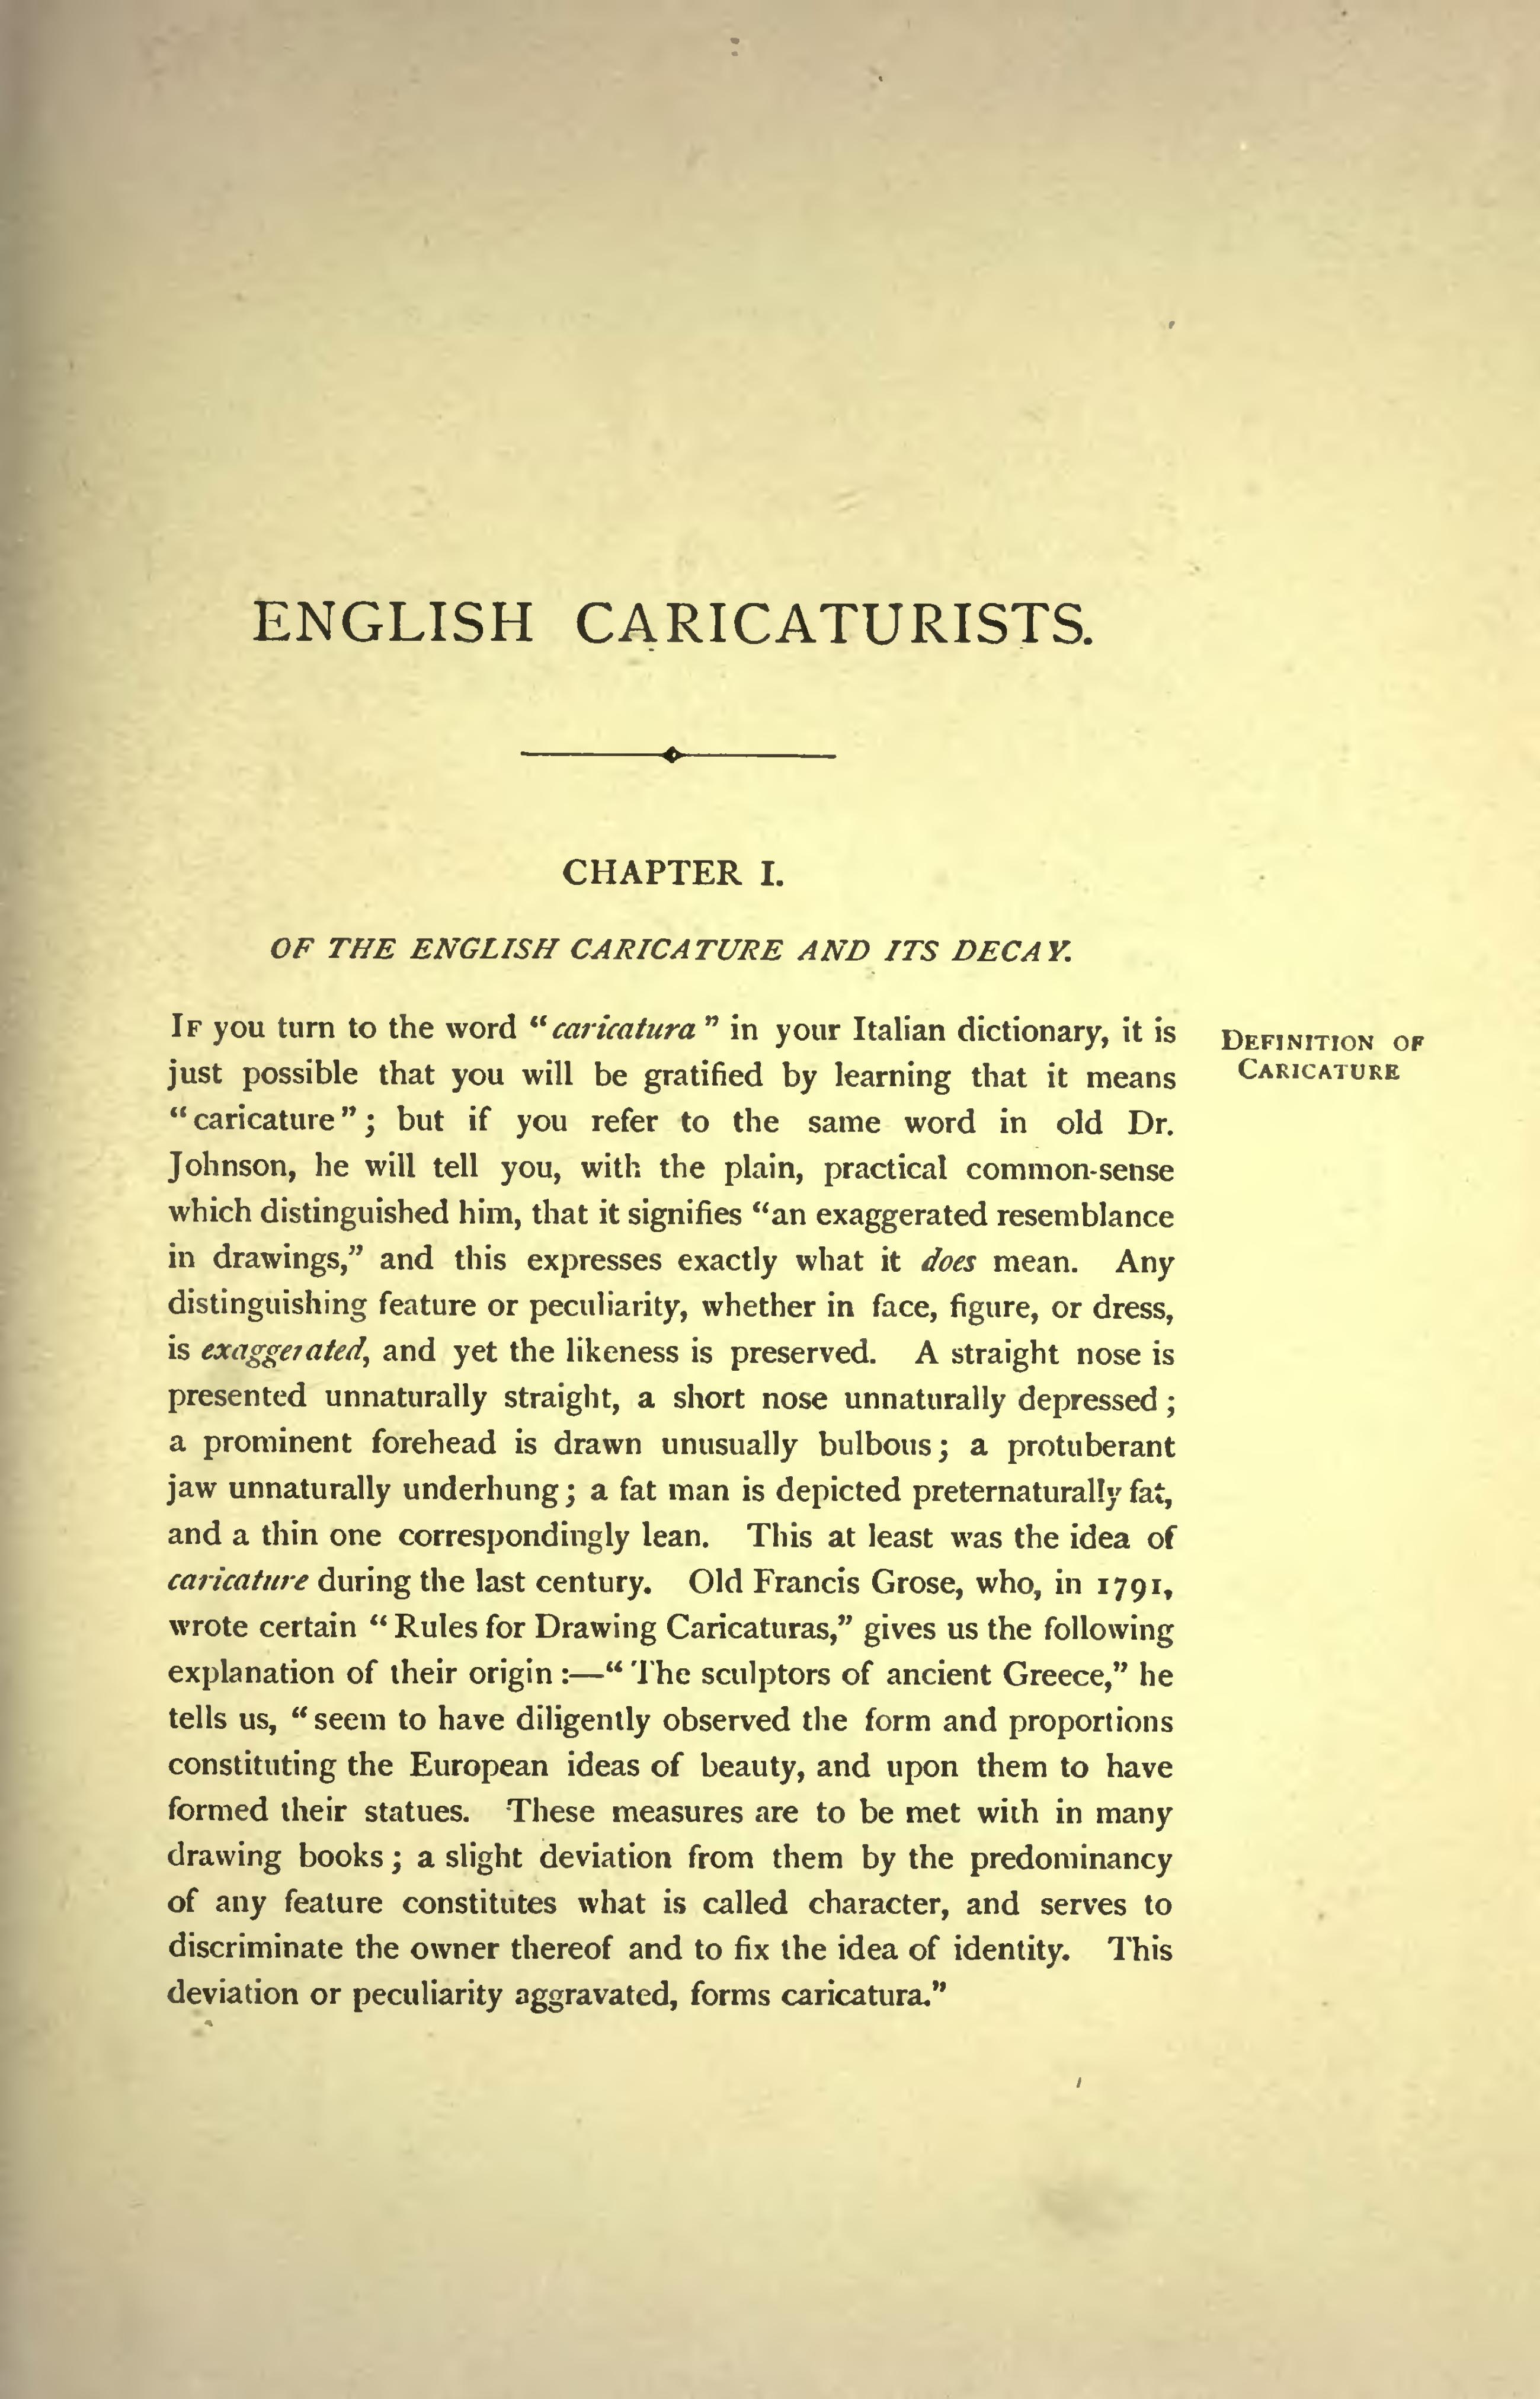 an essayist born 1785 Extract barbauld [née aikin], anna letitia [anna laetitia] (1743–1825), poet and essayist, was born on 20 june 1743 at kibworth harcourt, leicestershire, elder.